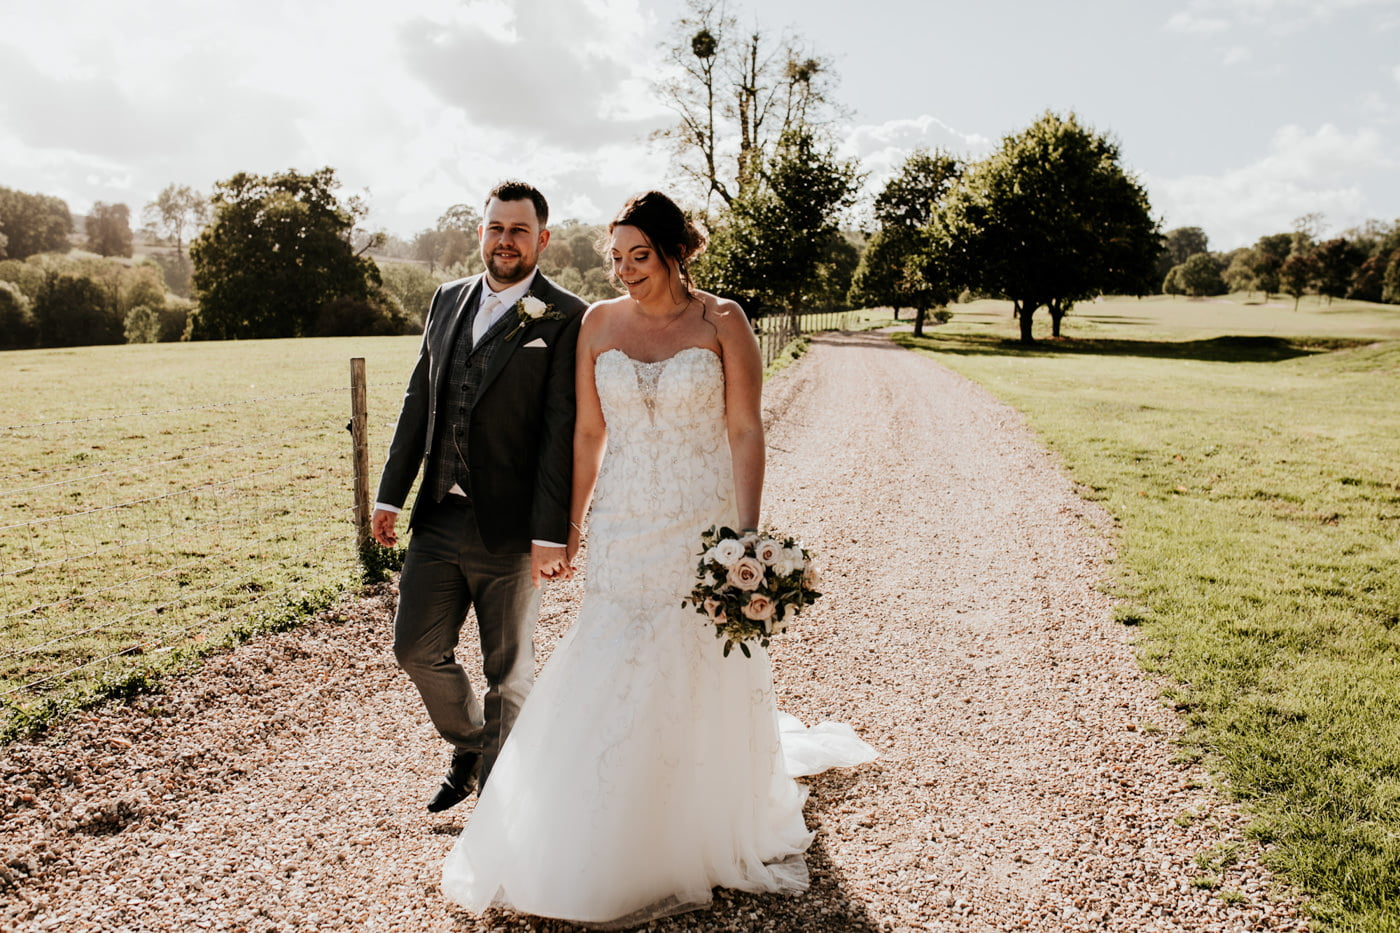 Leanne and Scott / Elmhay Park, Somerset 25